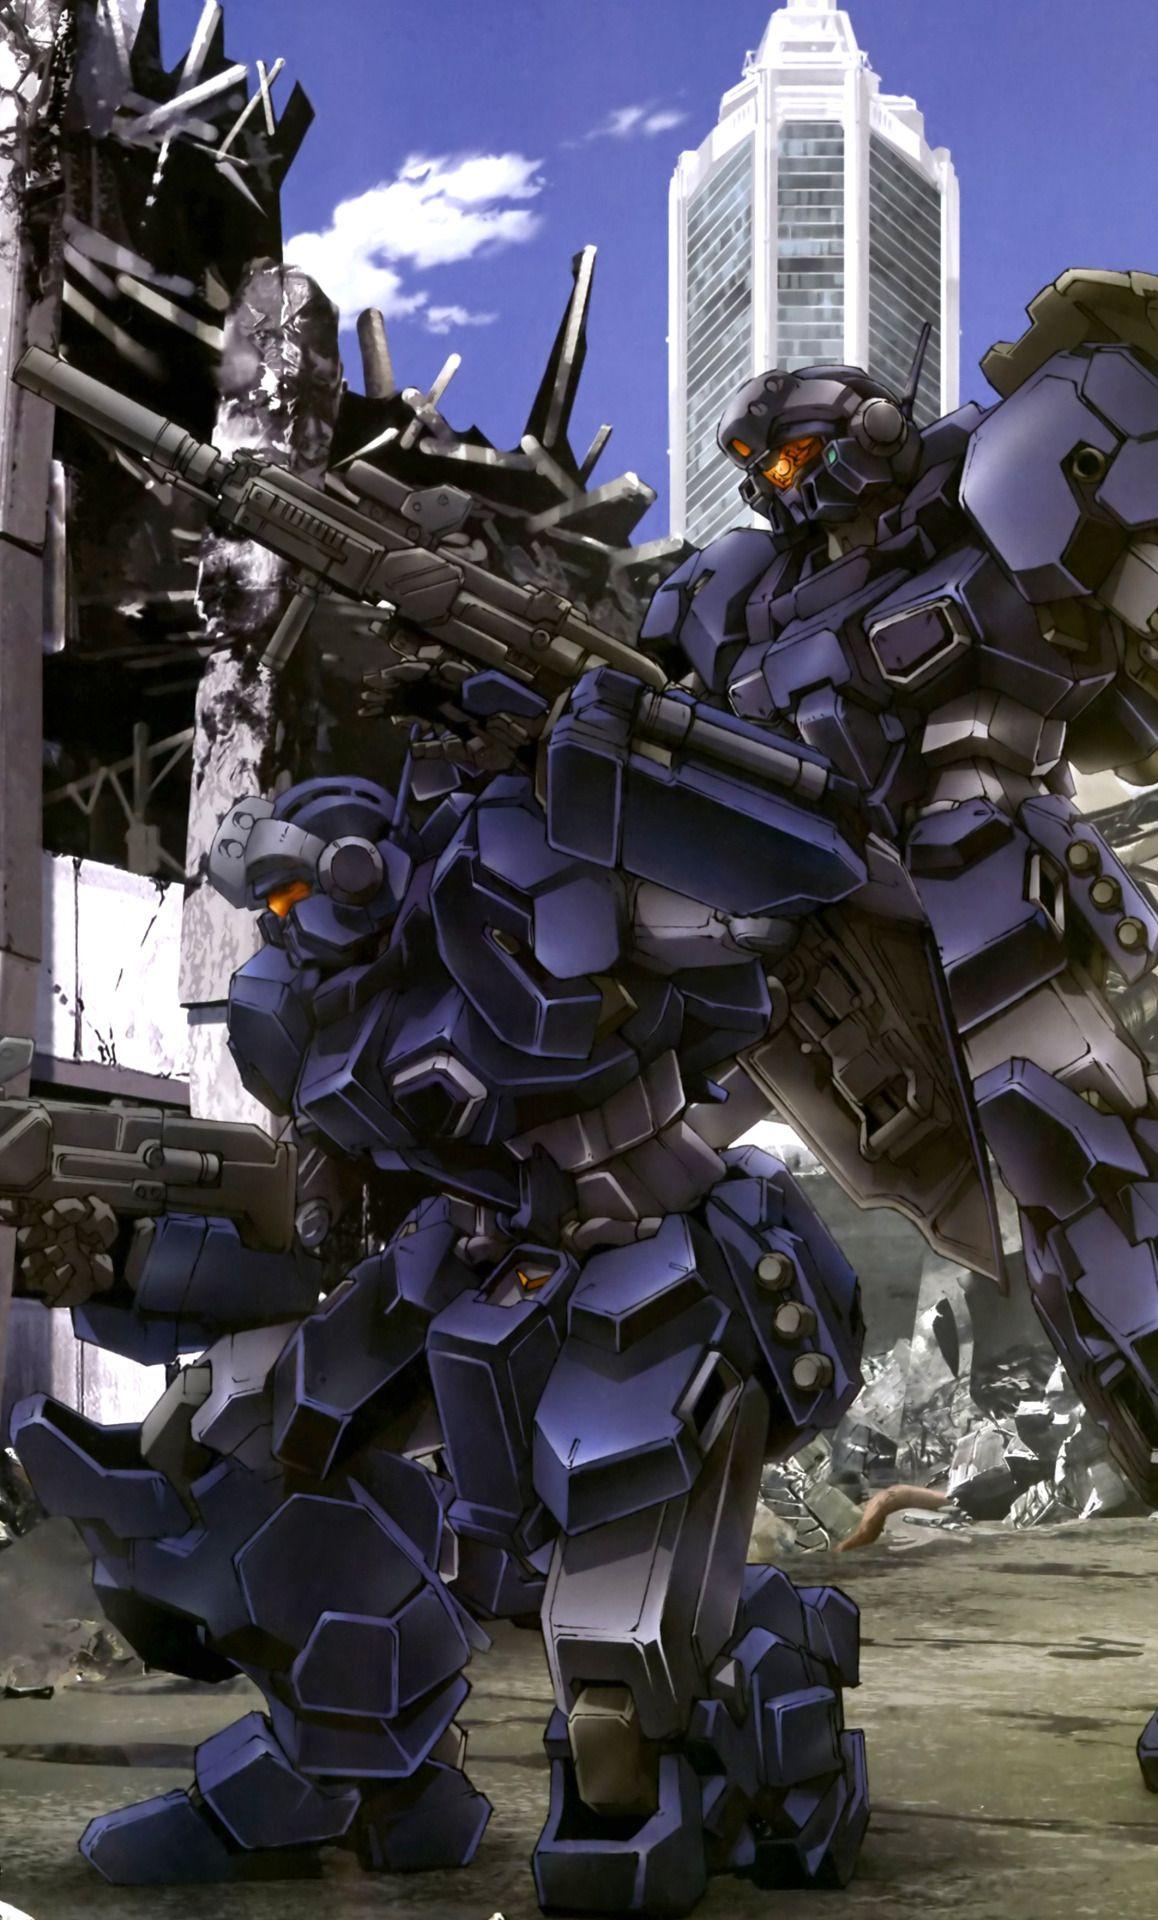 the JUMPGATE Photo in 2020 Gundam art, Gundam, Gundam